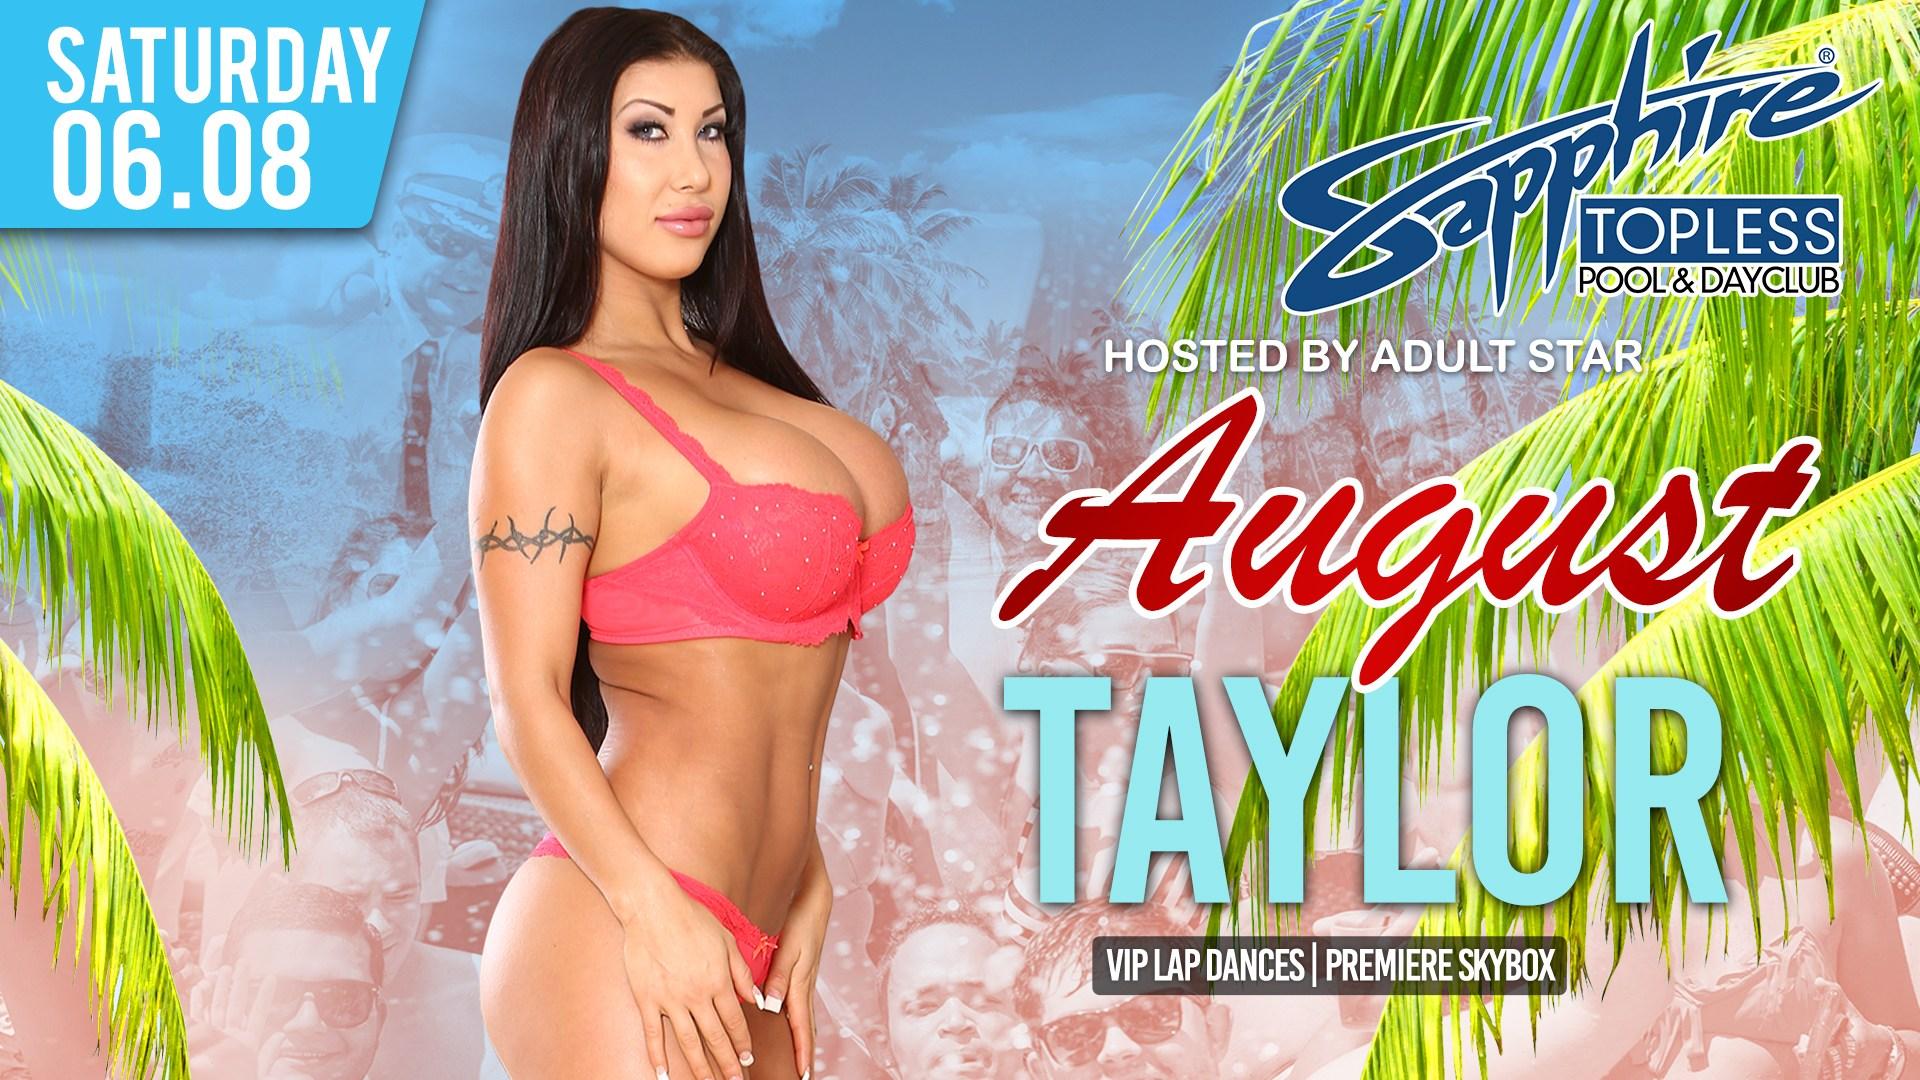 August Taylor – June 8, 2019